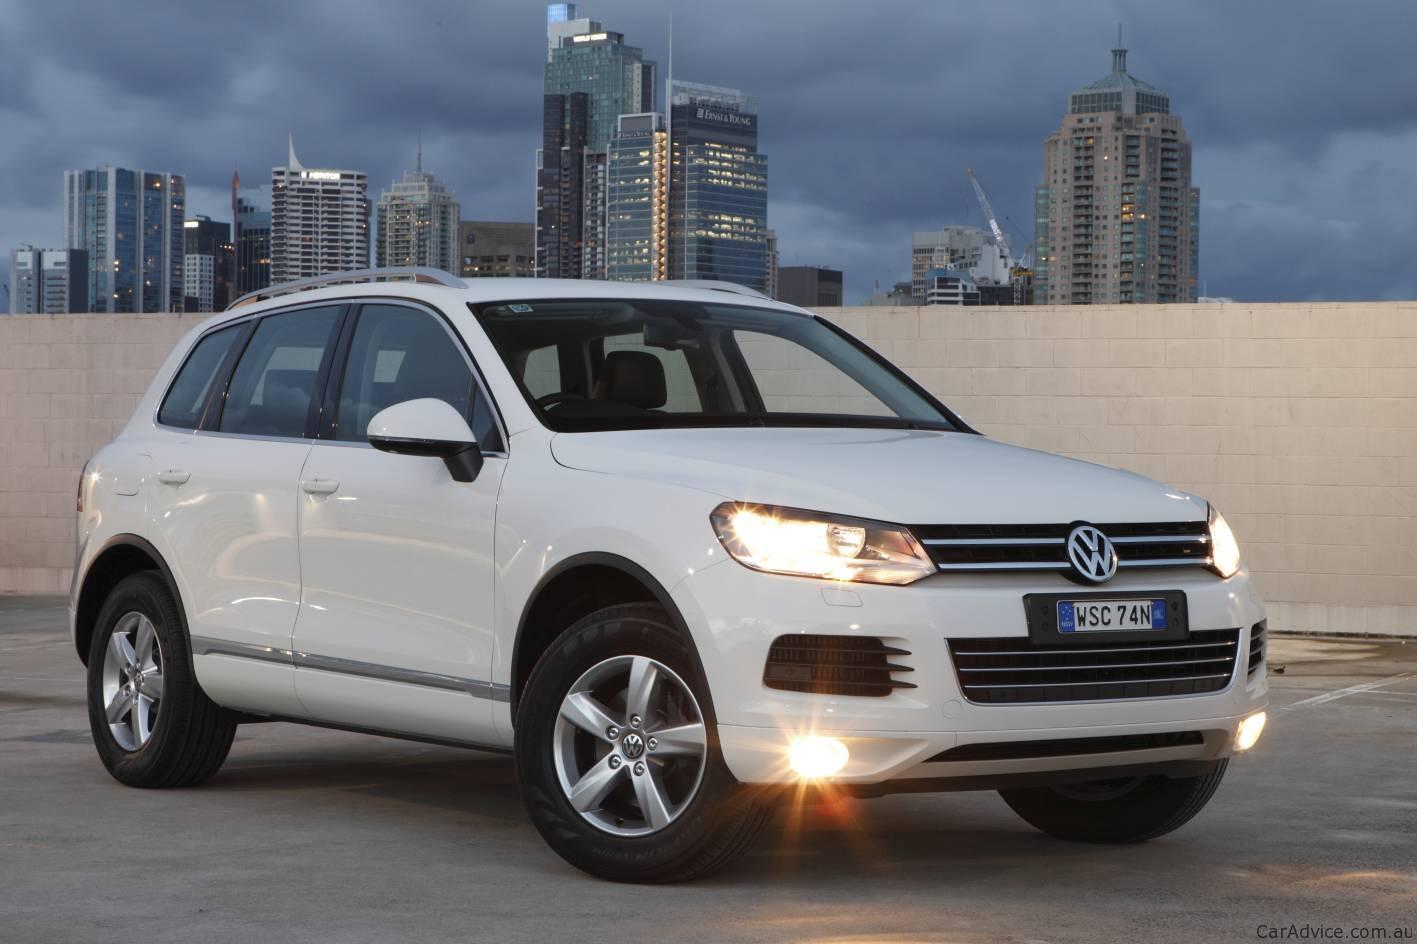 2012 Volkswagen Touareg At Australian International Motor